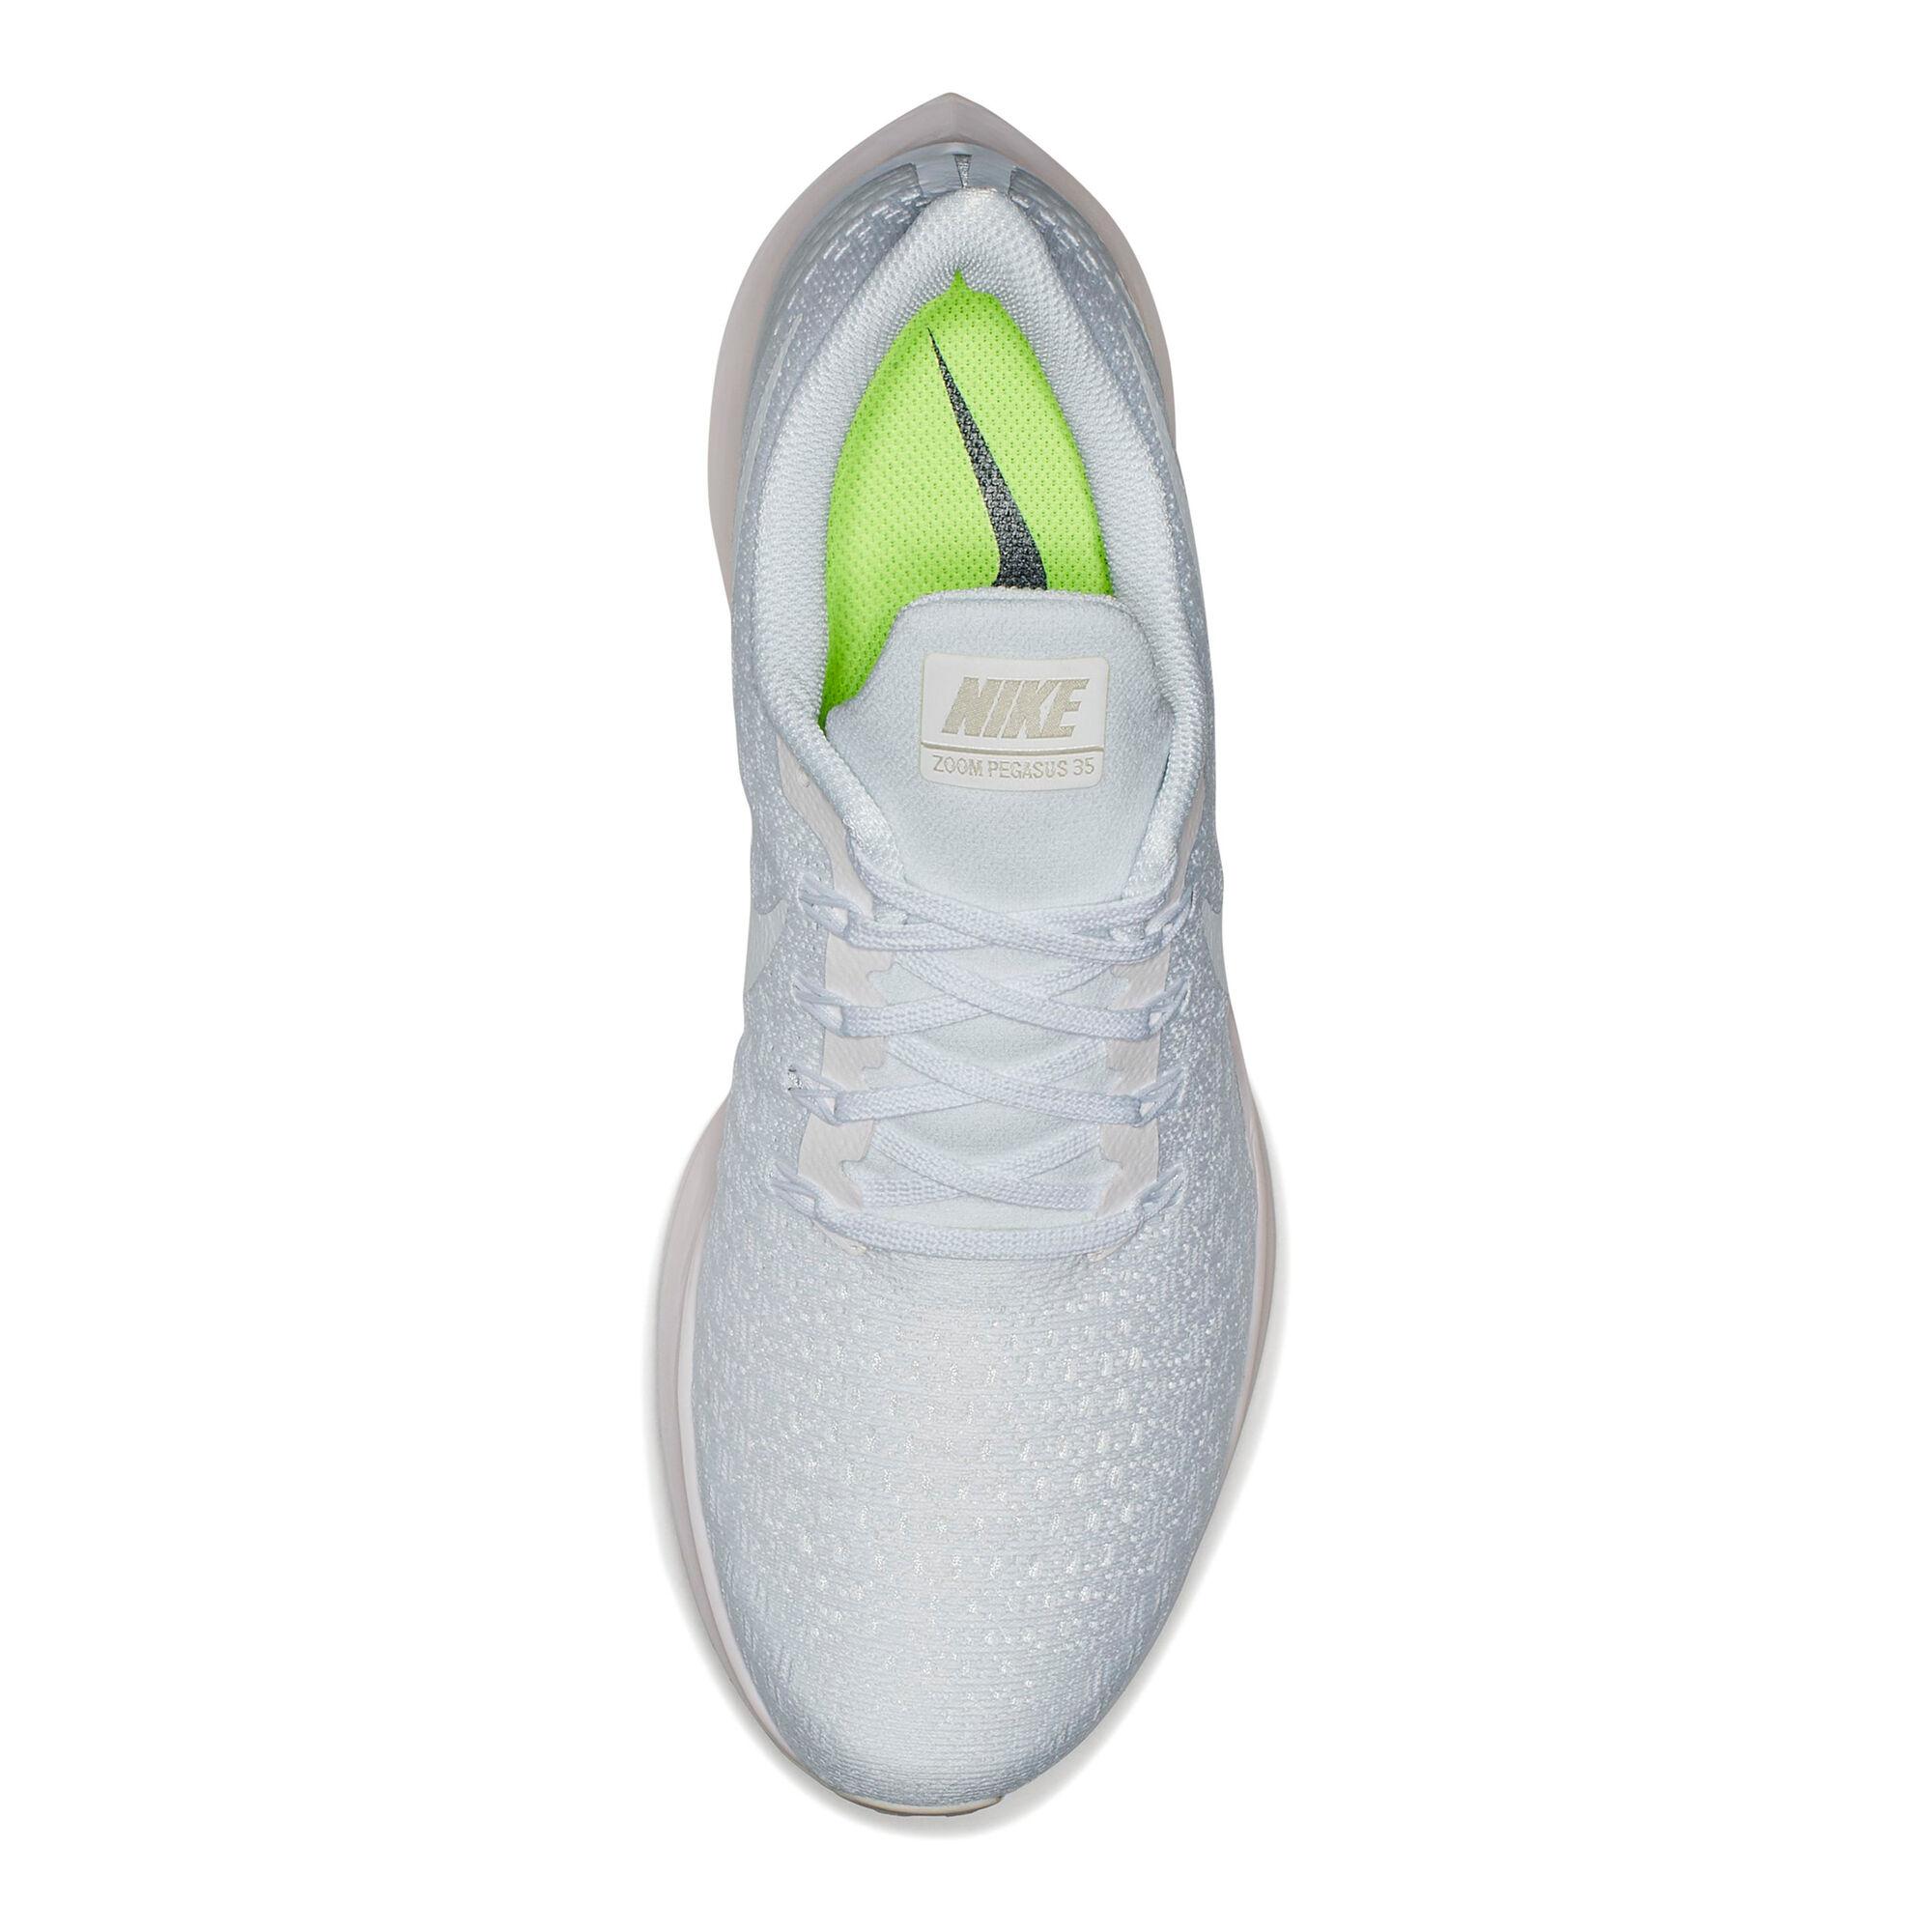 7496b7799a18a buy Nike Air Zoom Pegasus 35 Neutral Running Shoe Men - White ...